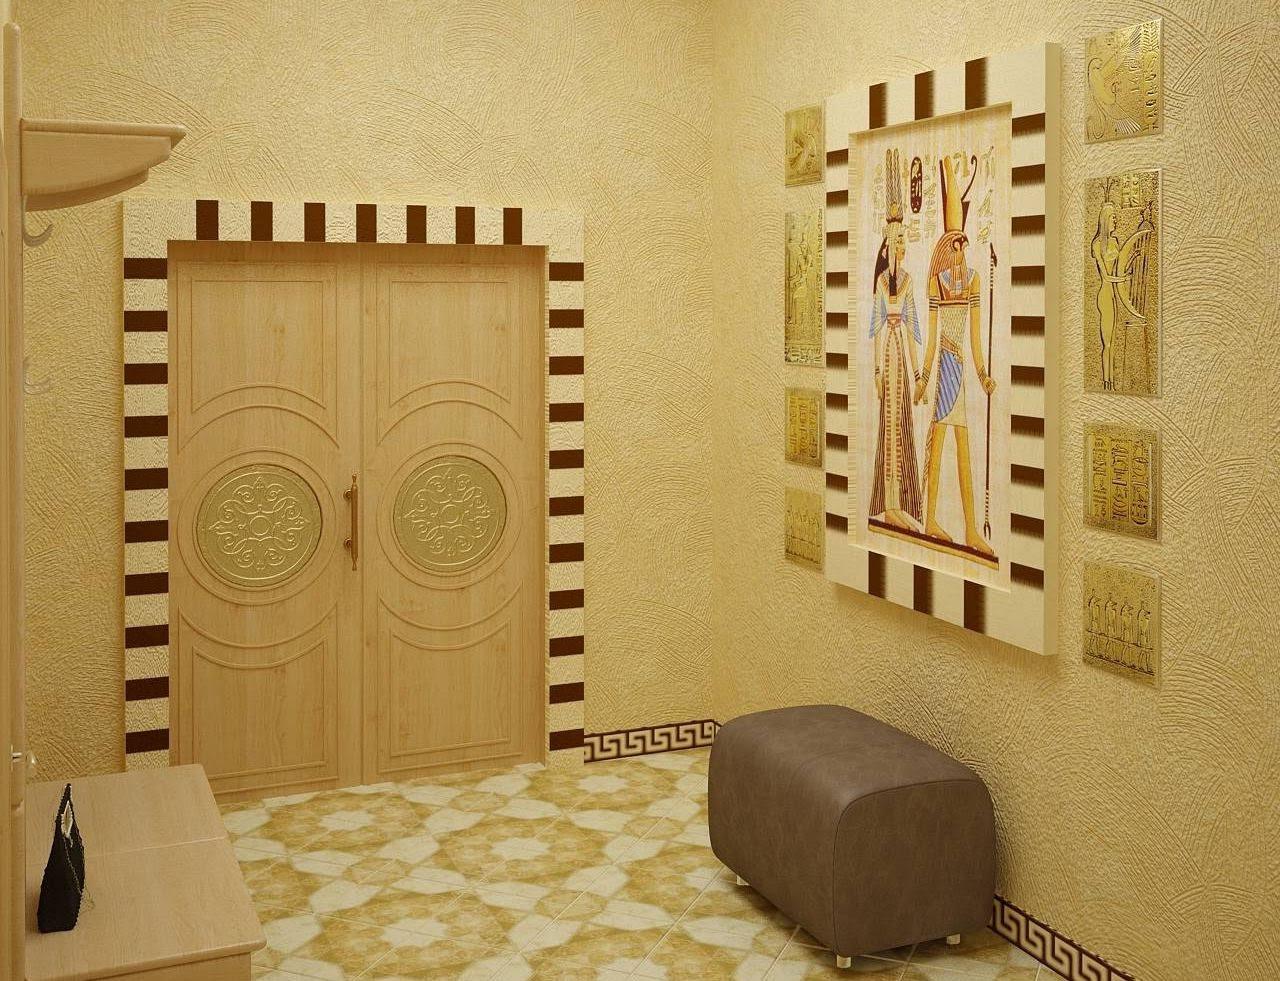 48 Ide Interior Design Egypt HD Unduh Gratis